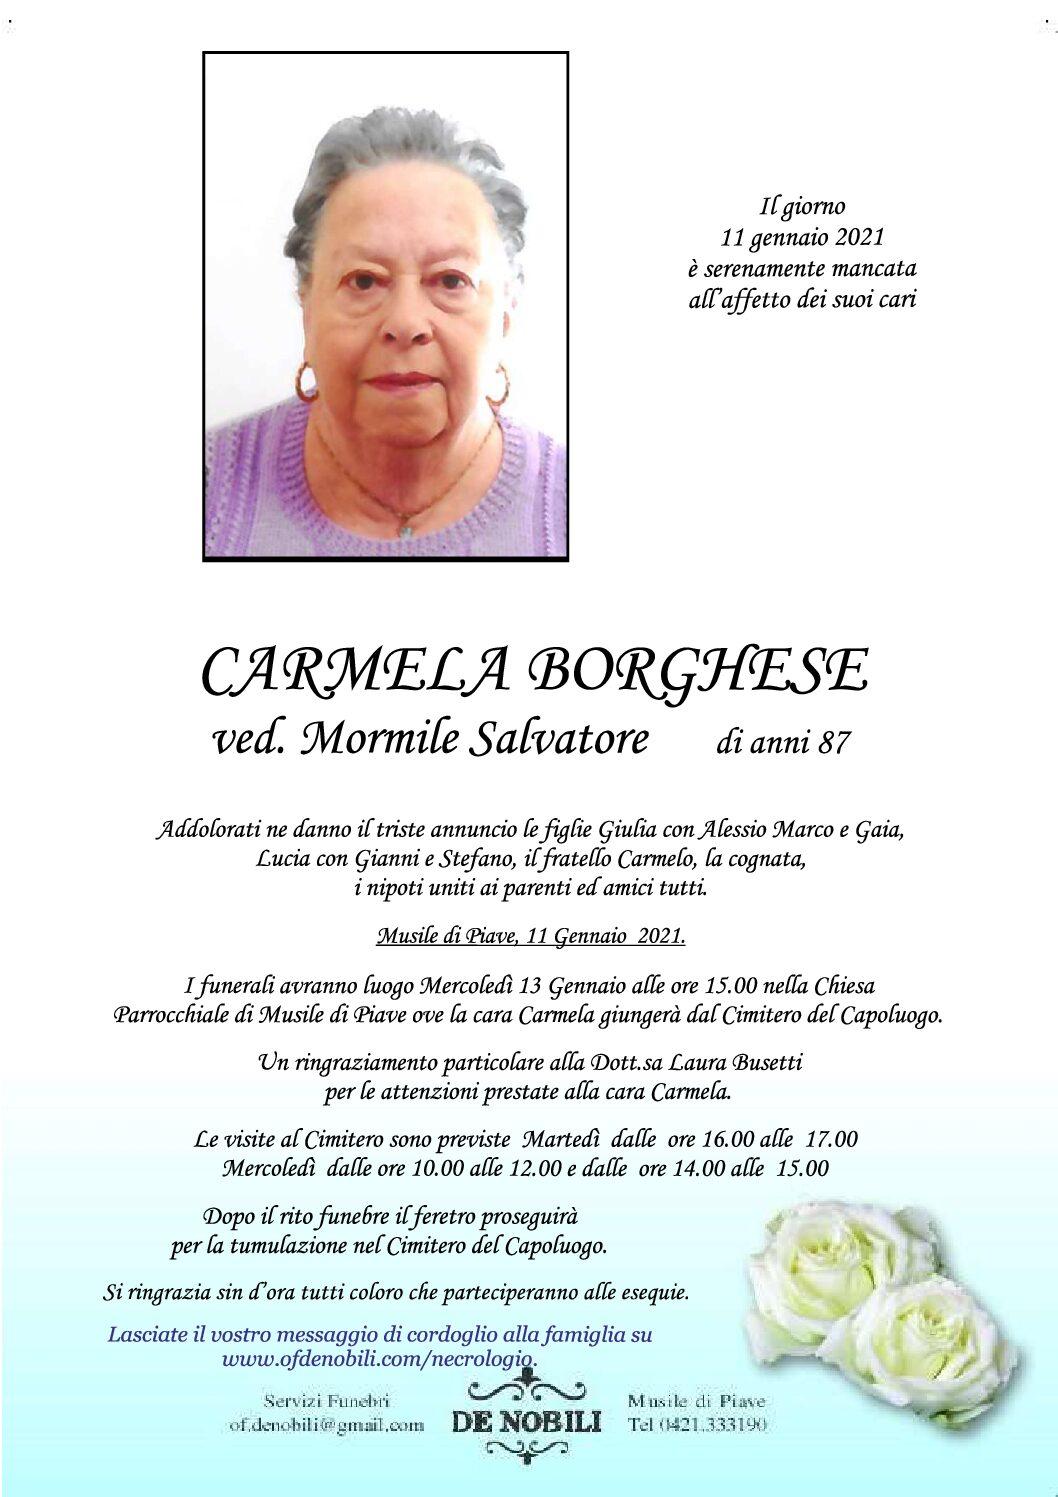 Carmela Borghese